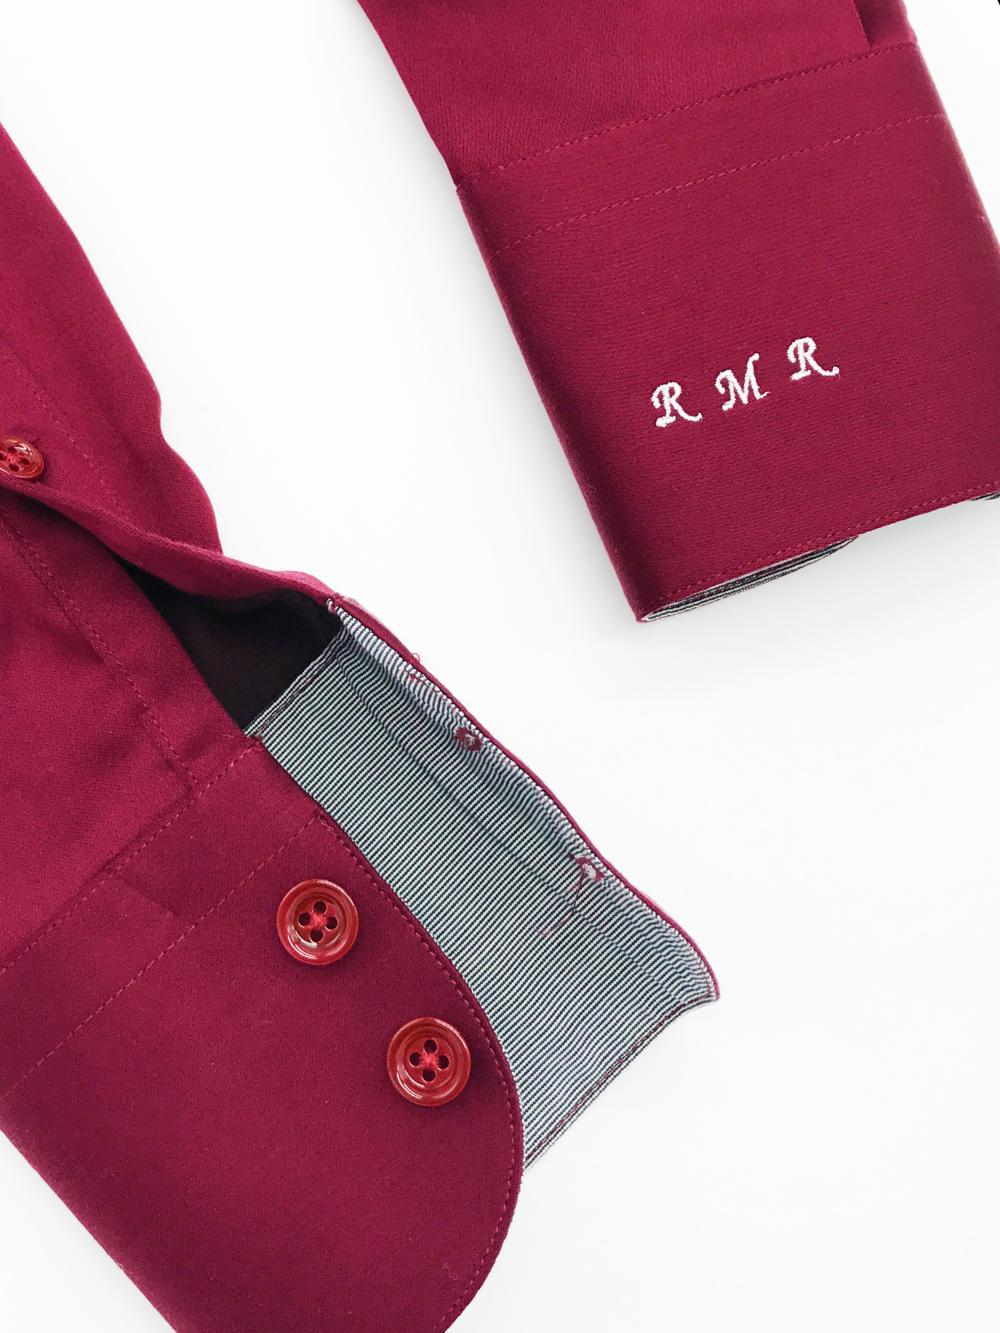 NewShirts-4.png